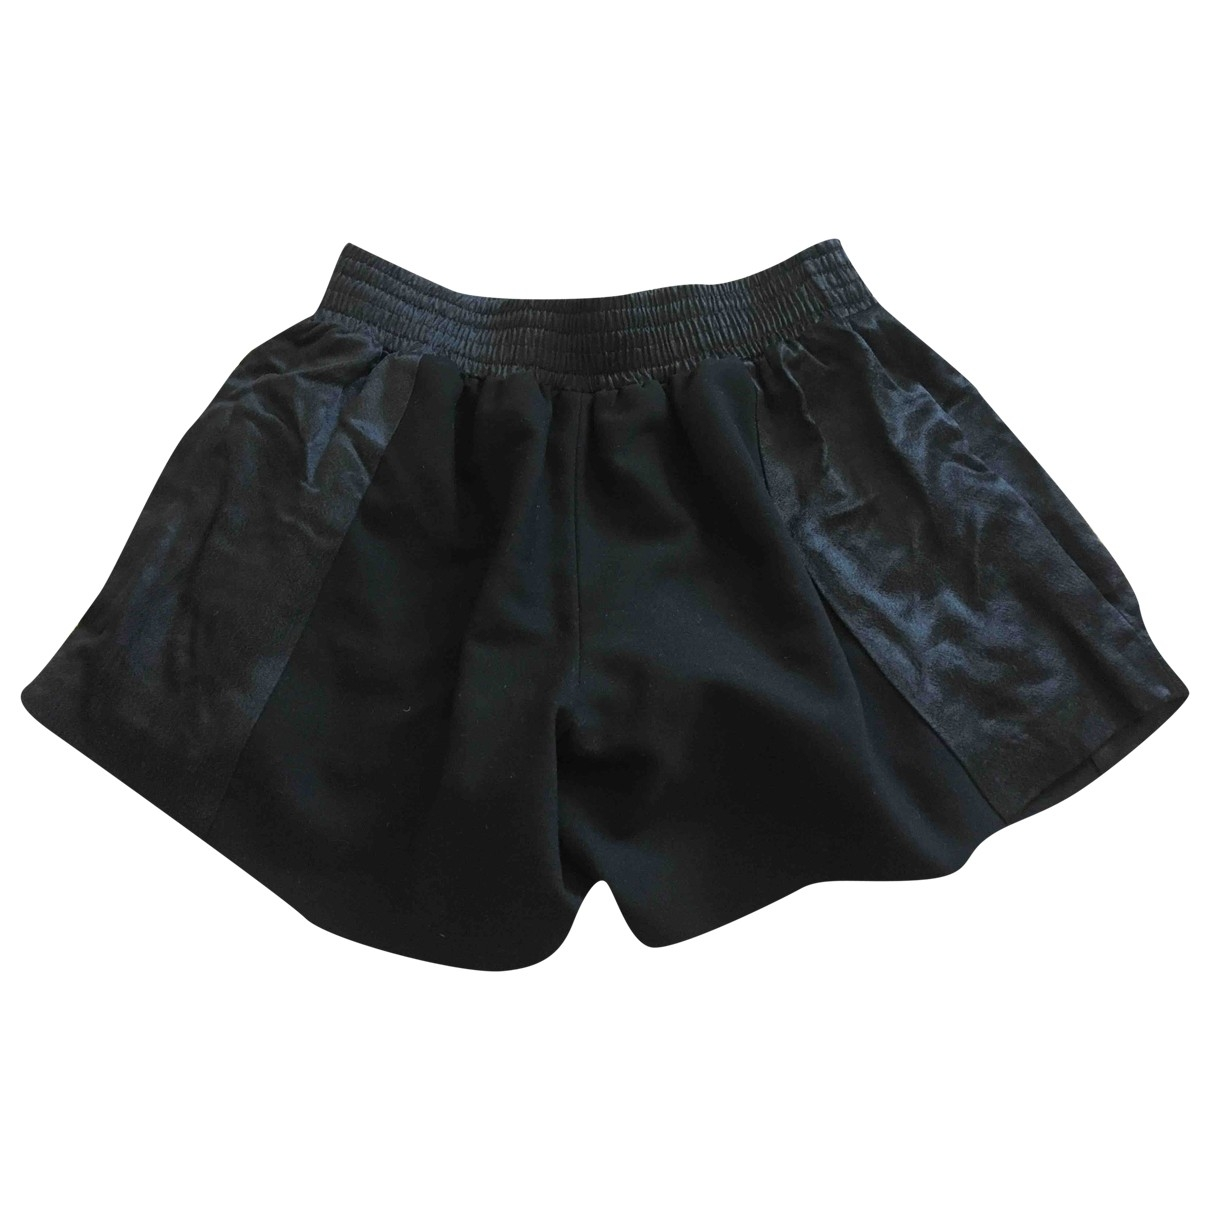 Maje \N Shorts in  Schwarz Polyester